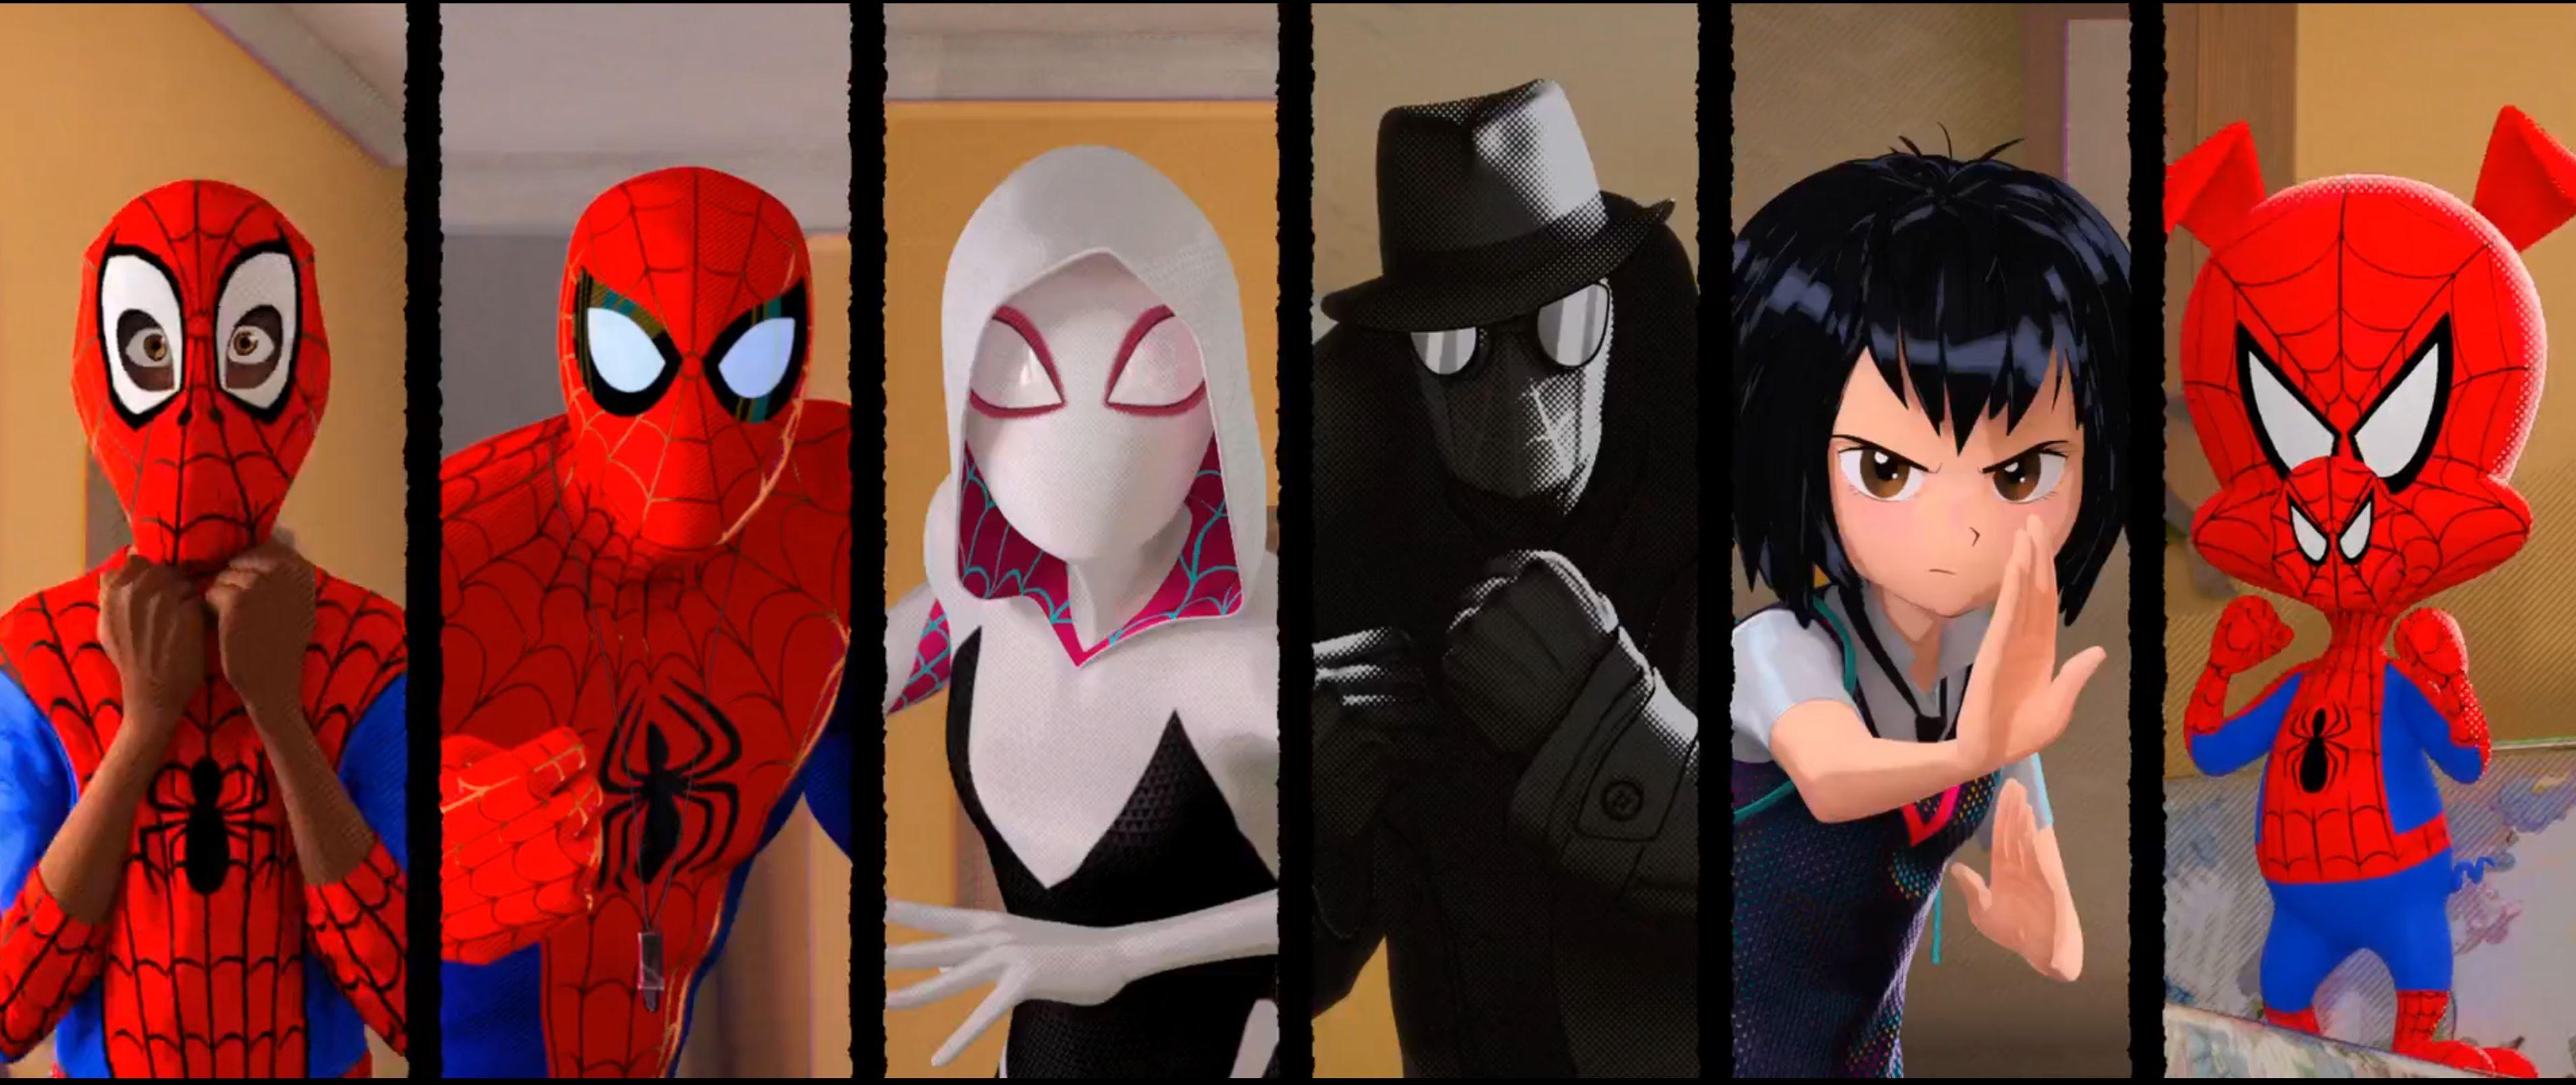 فیلم انیمیشن Spider-Man: Into the Spider-Verse